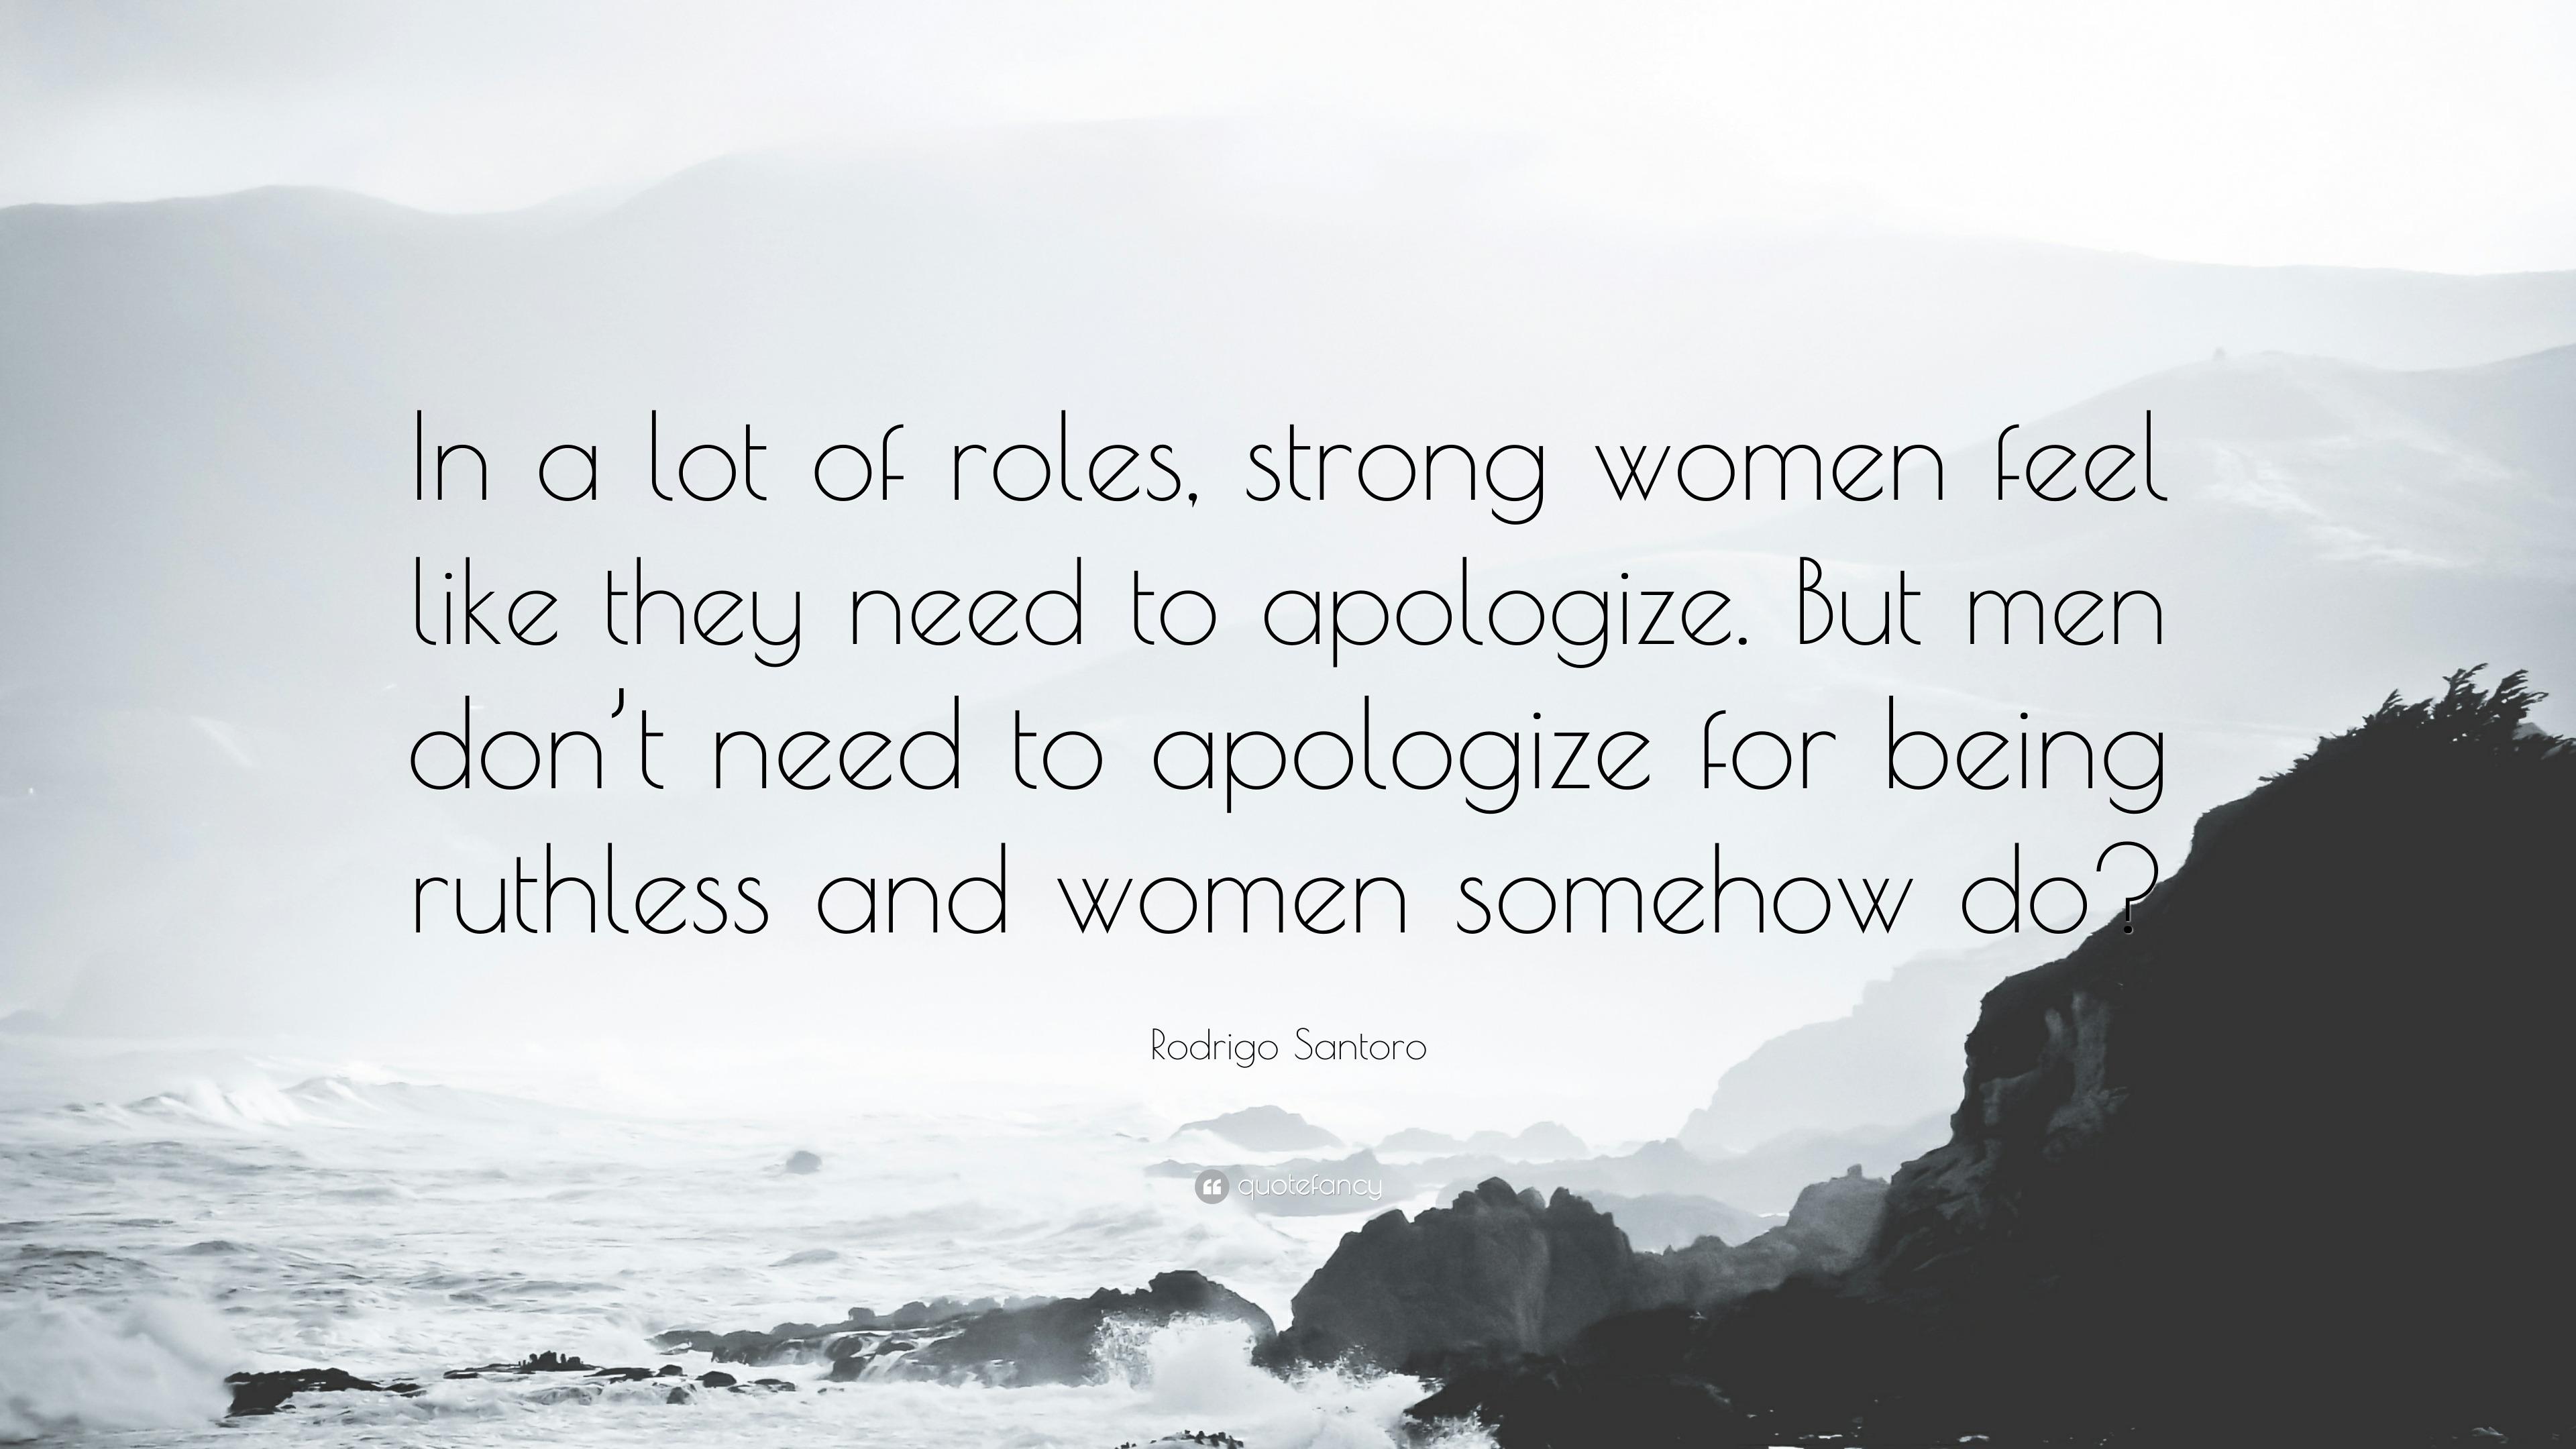 Quotes For Strong Women Rodrigo Santoro Quotes 5 Wallpapers  Quotefancy